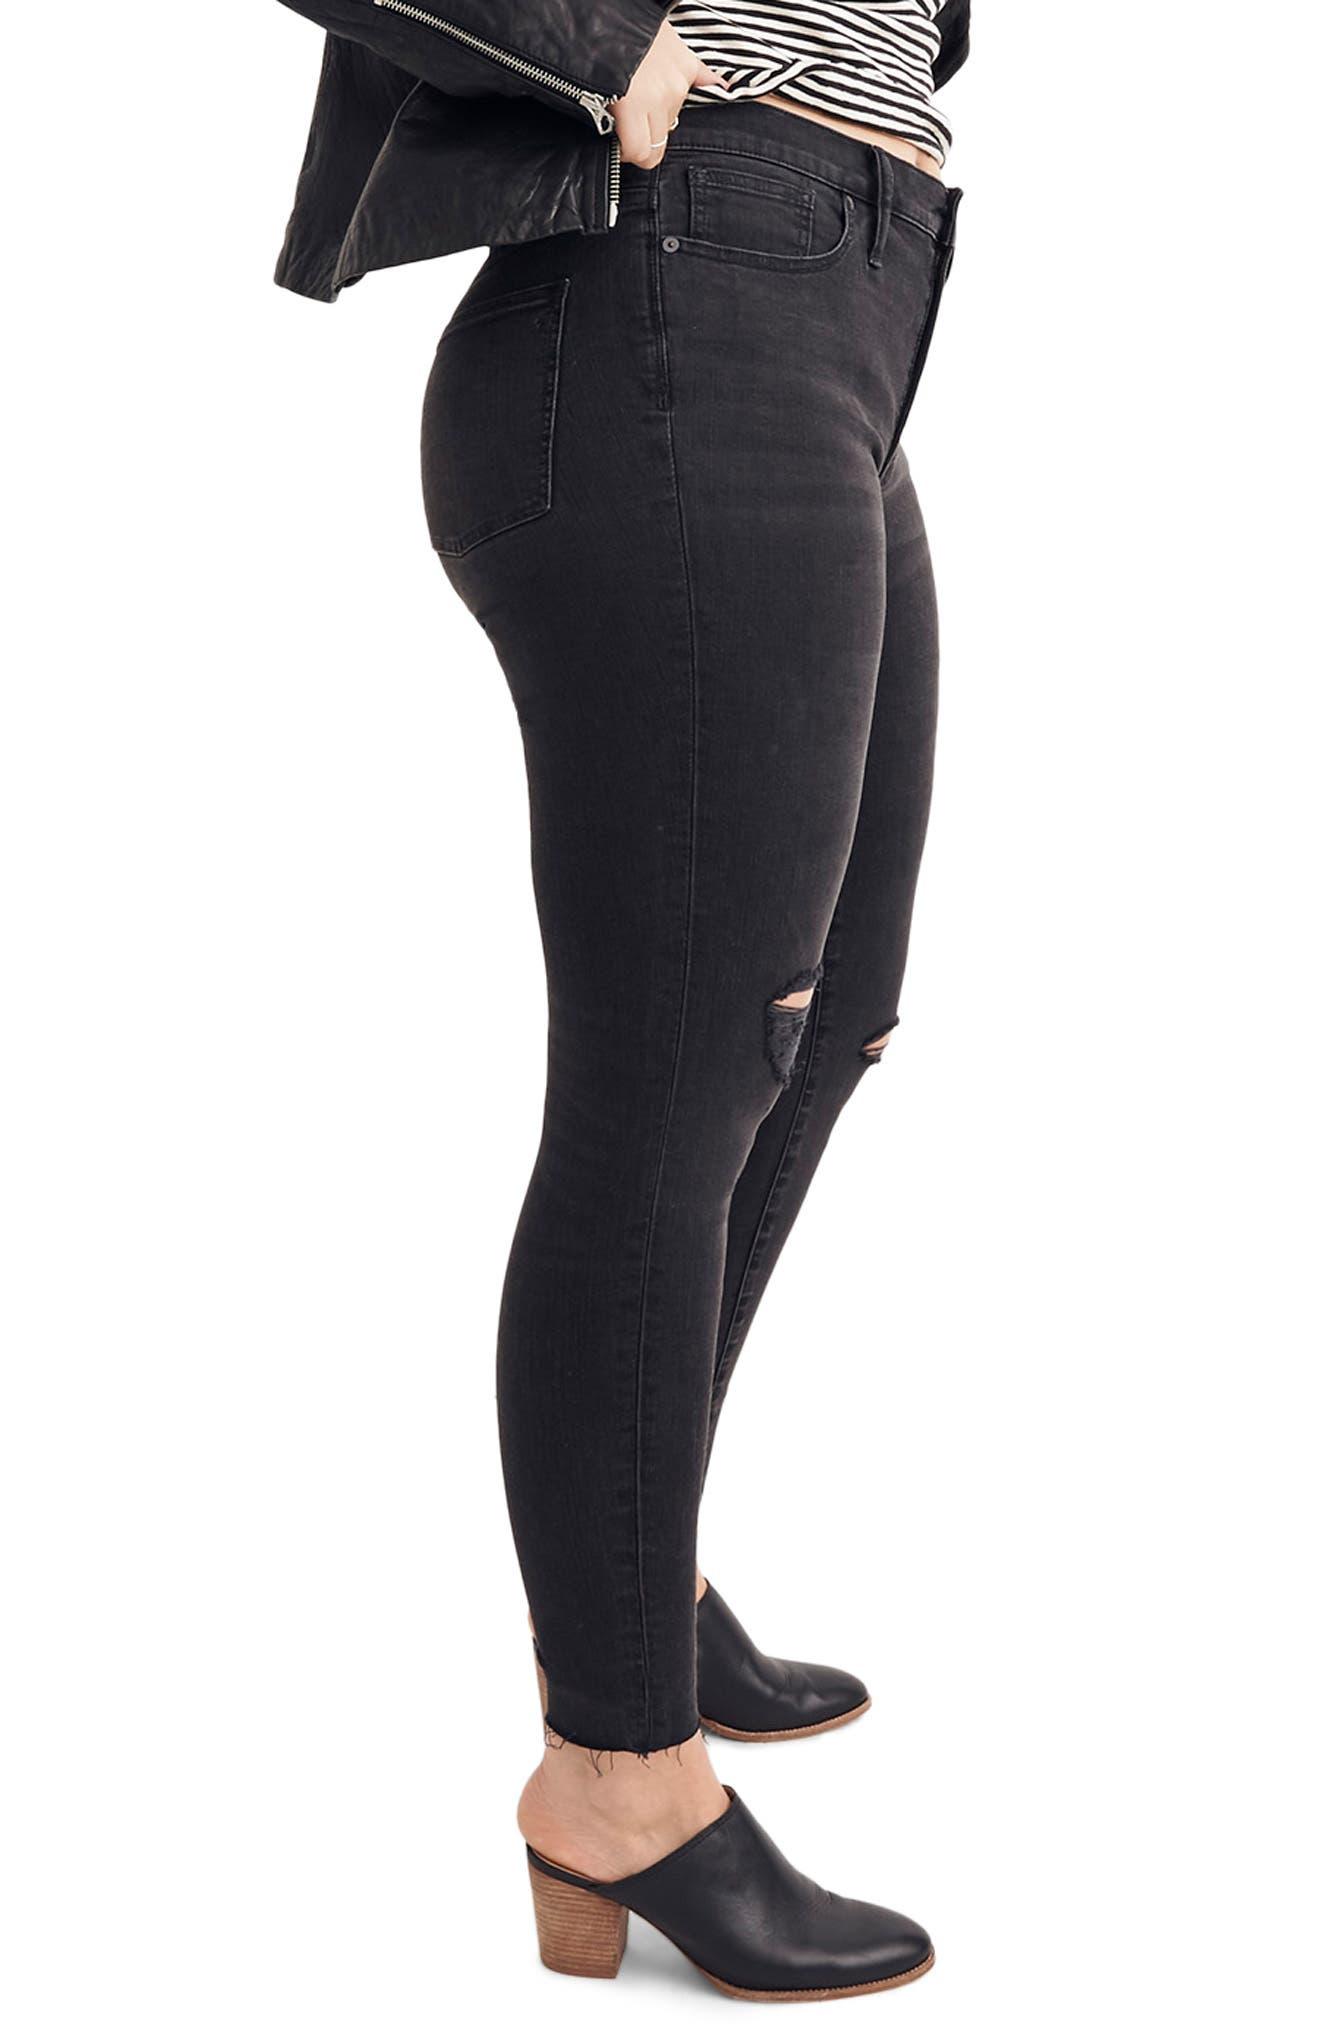 9-Inch High Waist Skinny Jeans,                             Alternate thumbnail 7, color,                             BLACK SEA